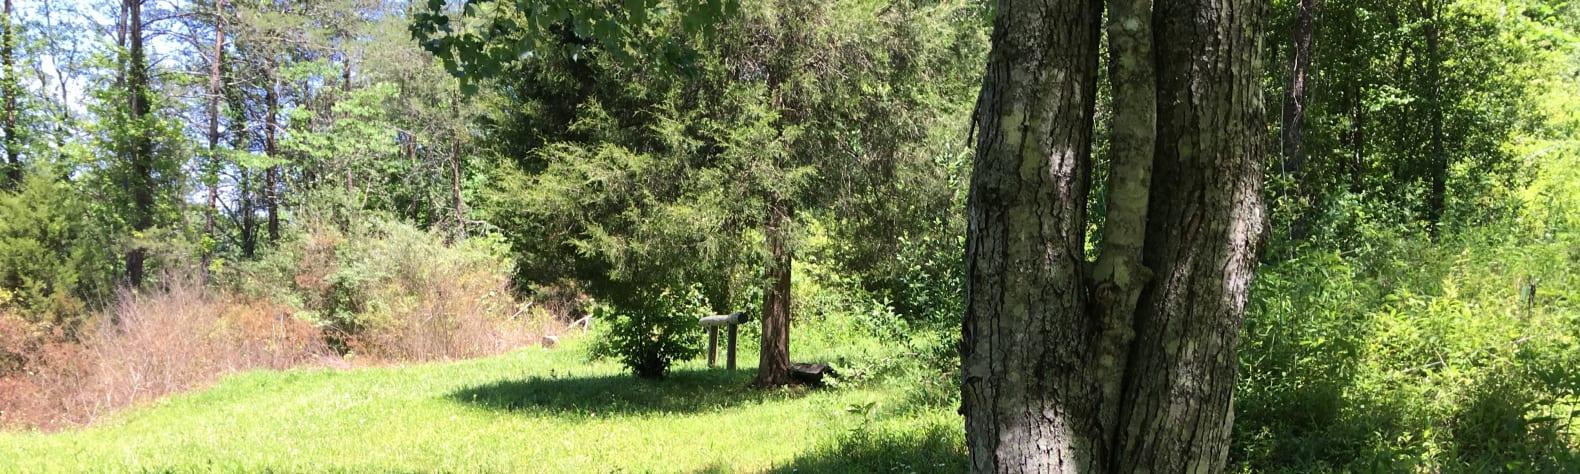 Kentucky Foothills Retreat